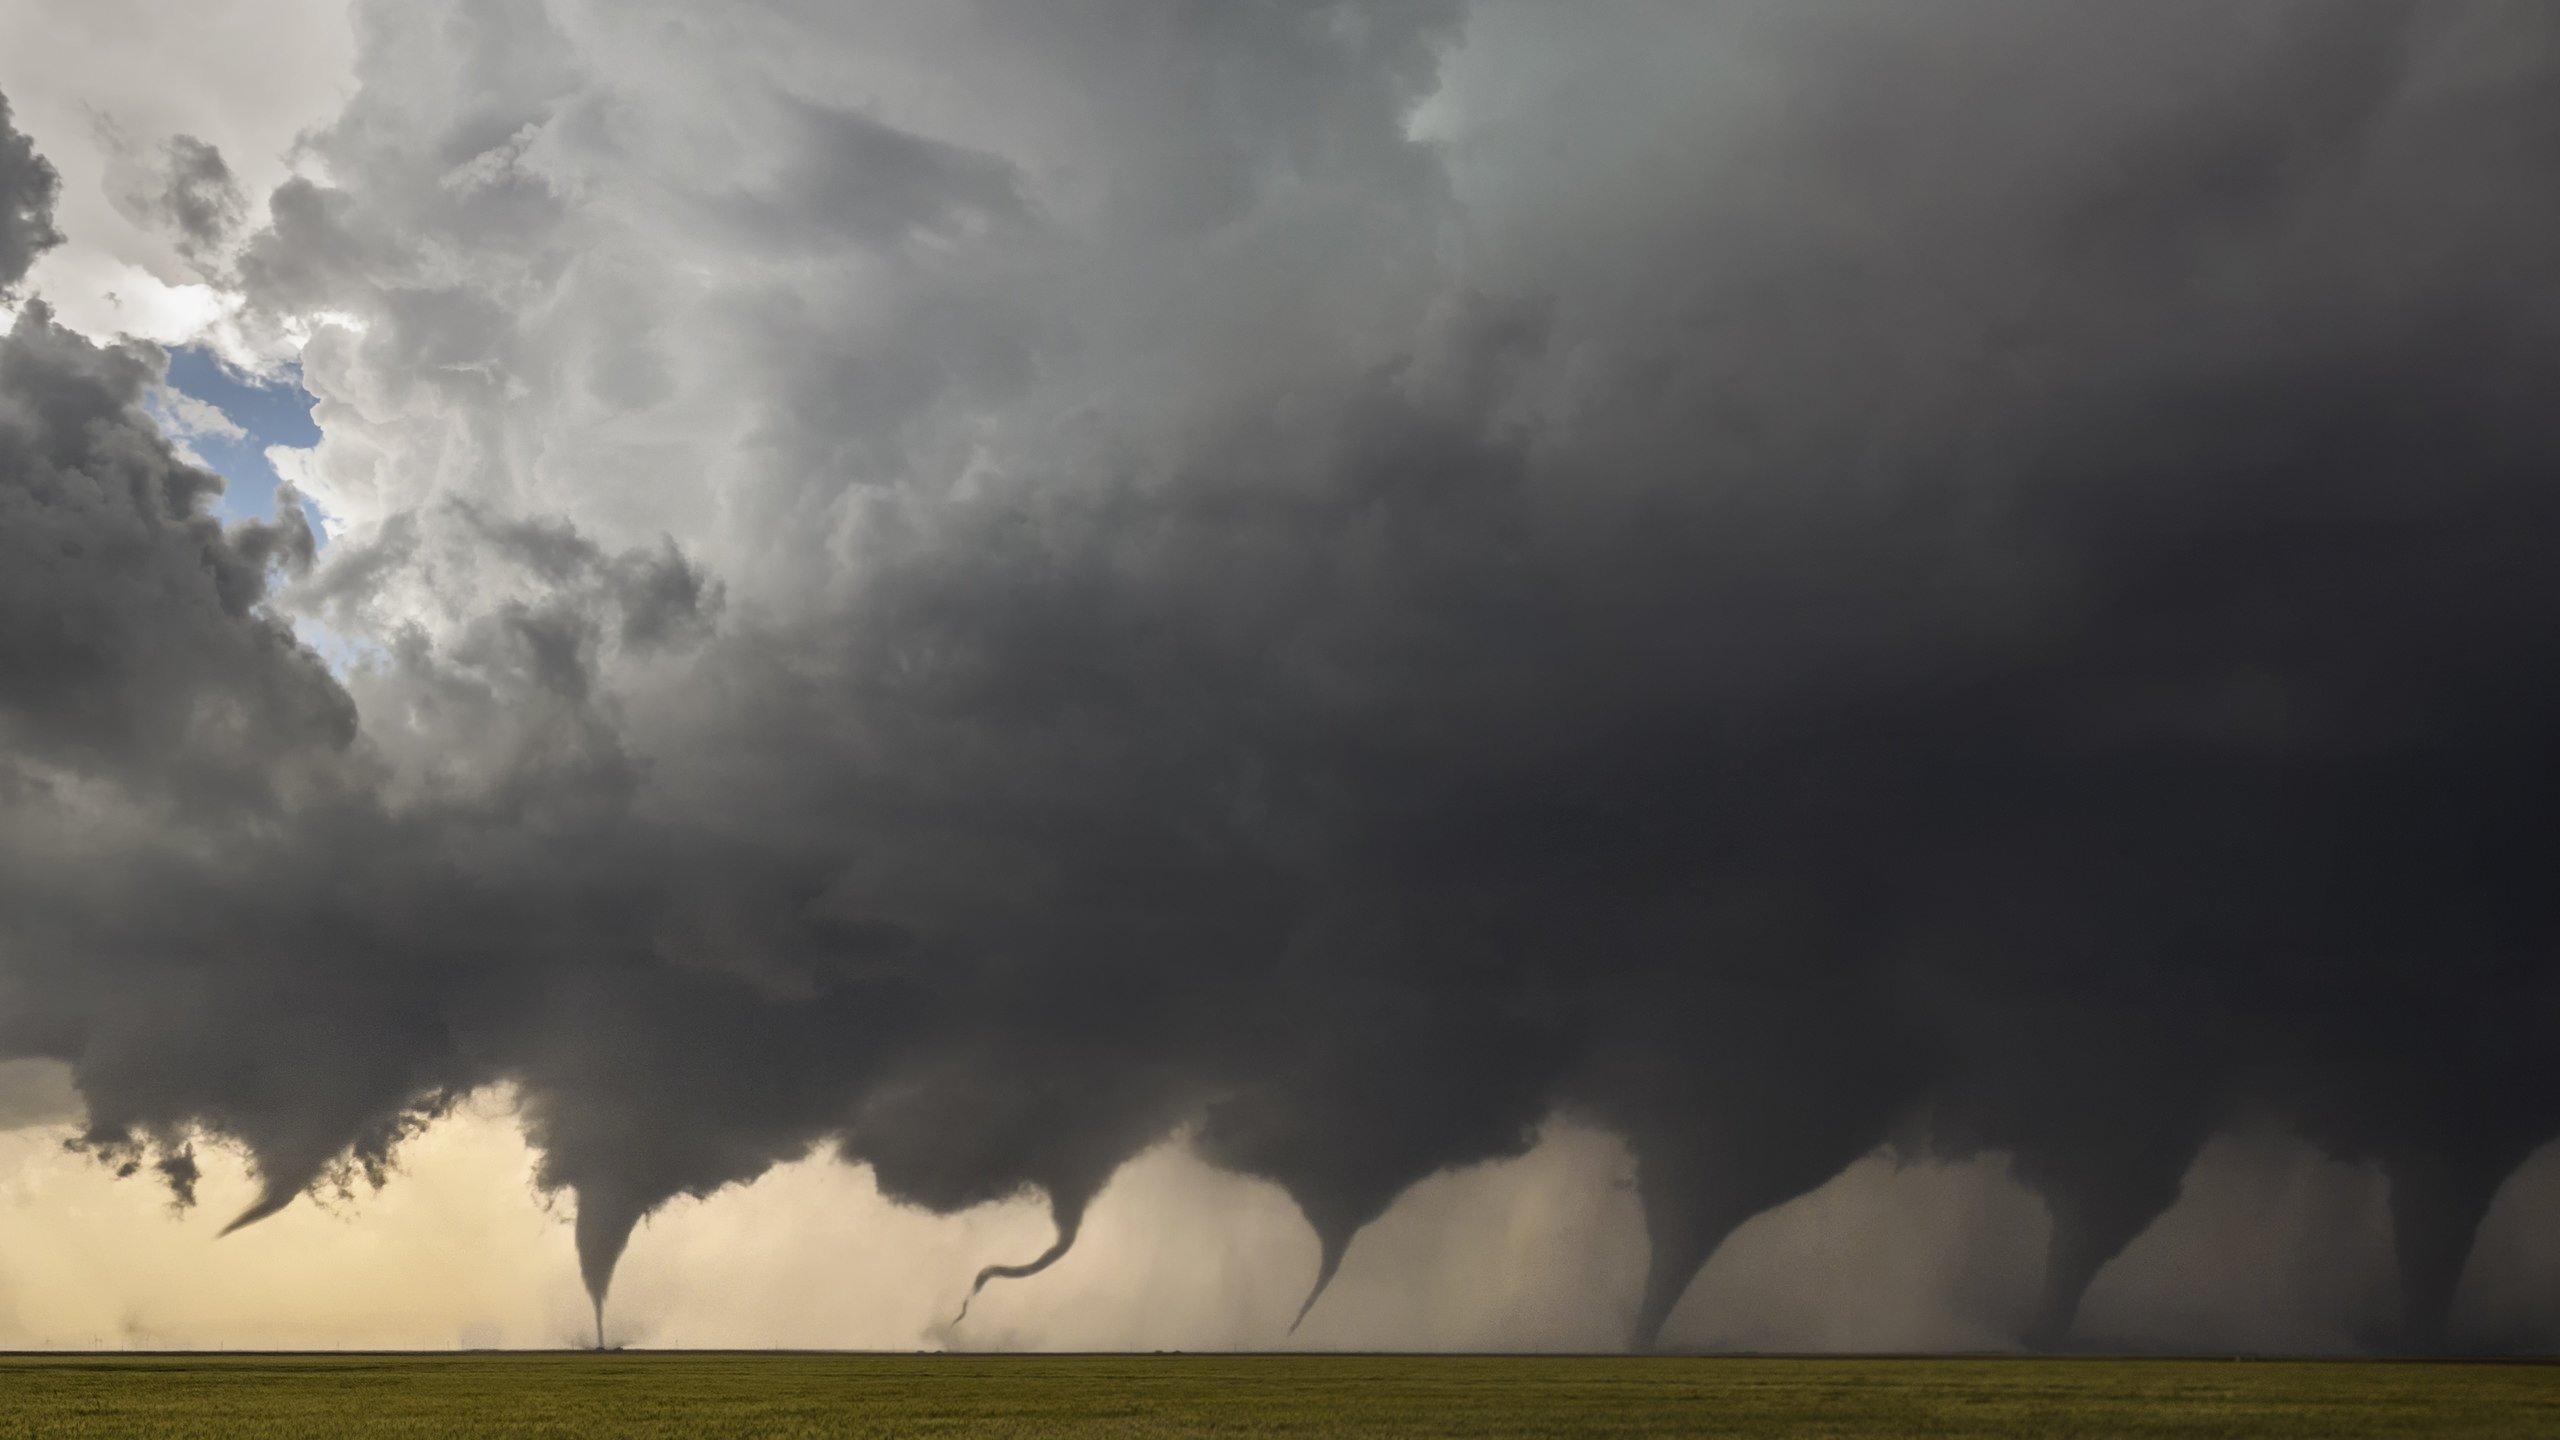 Evolution of a Tornado wallpaper